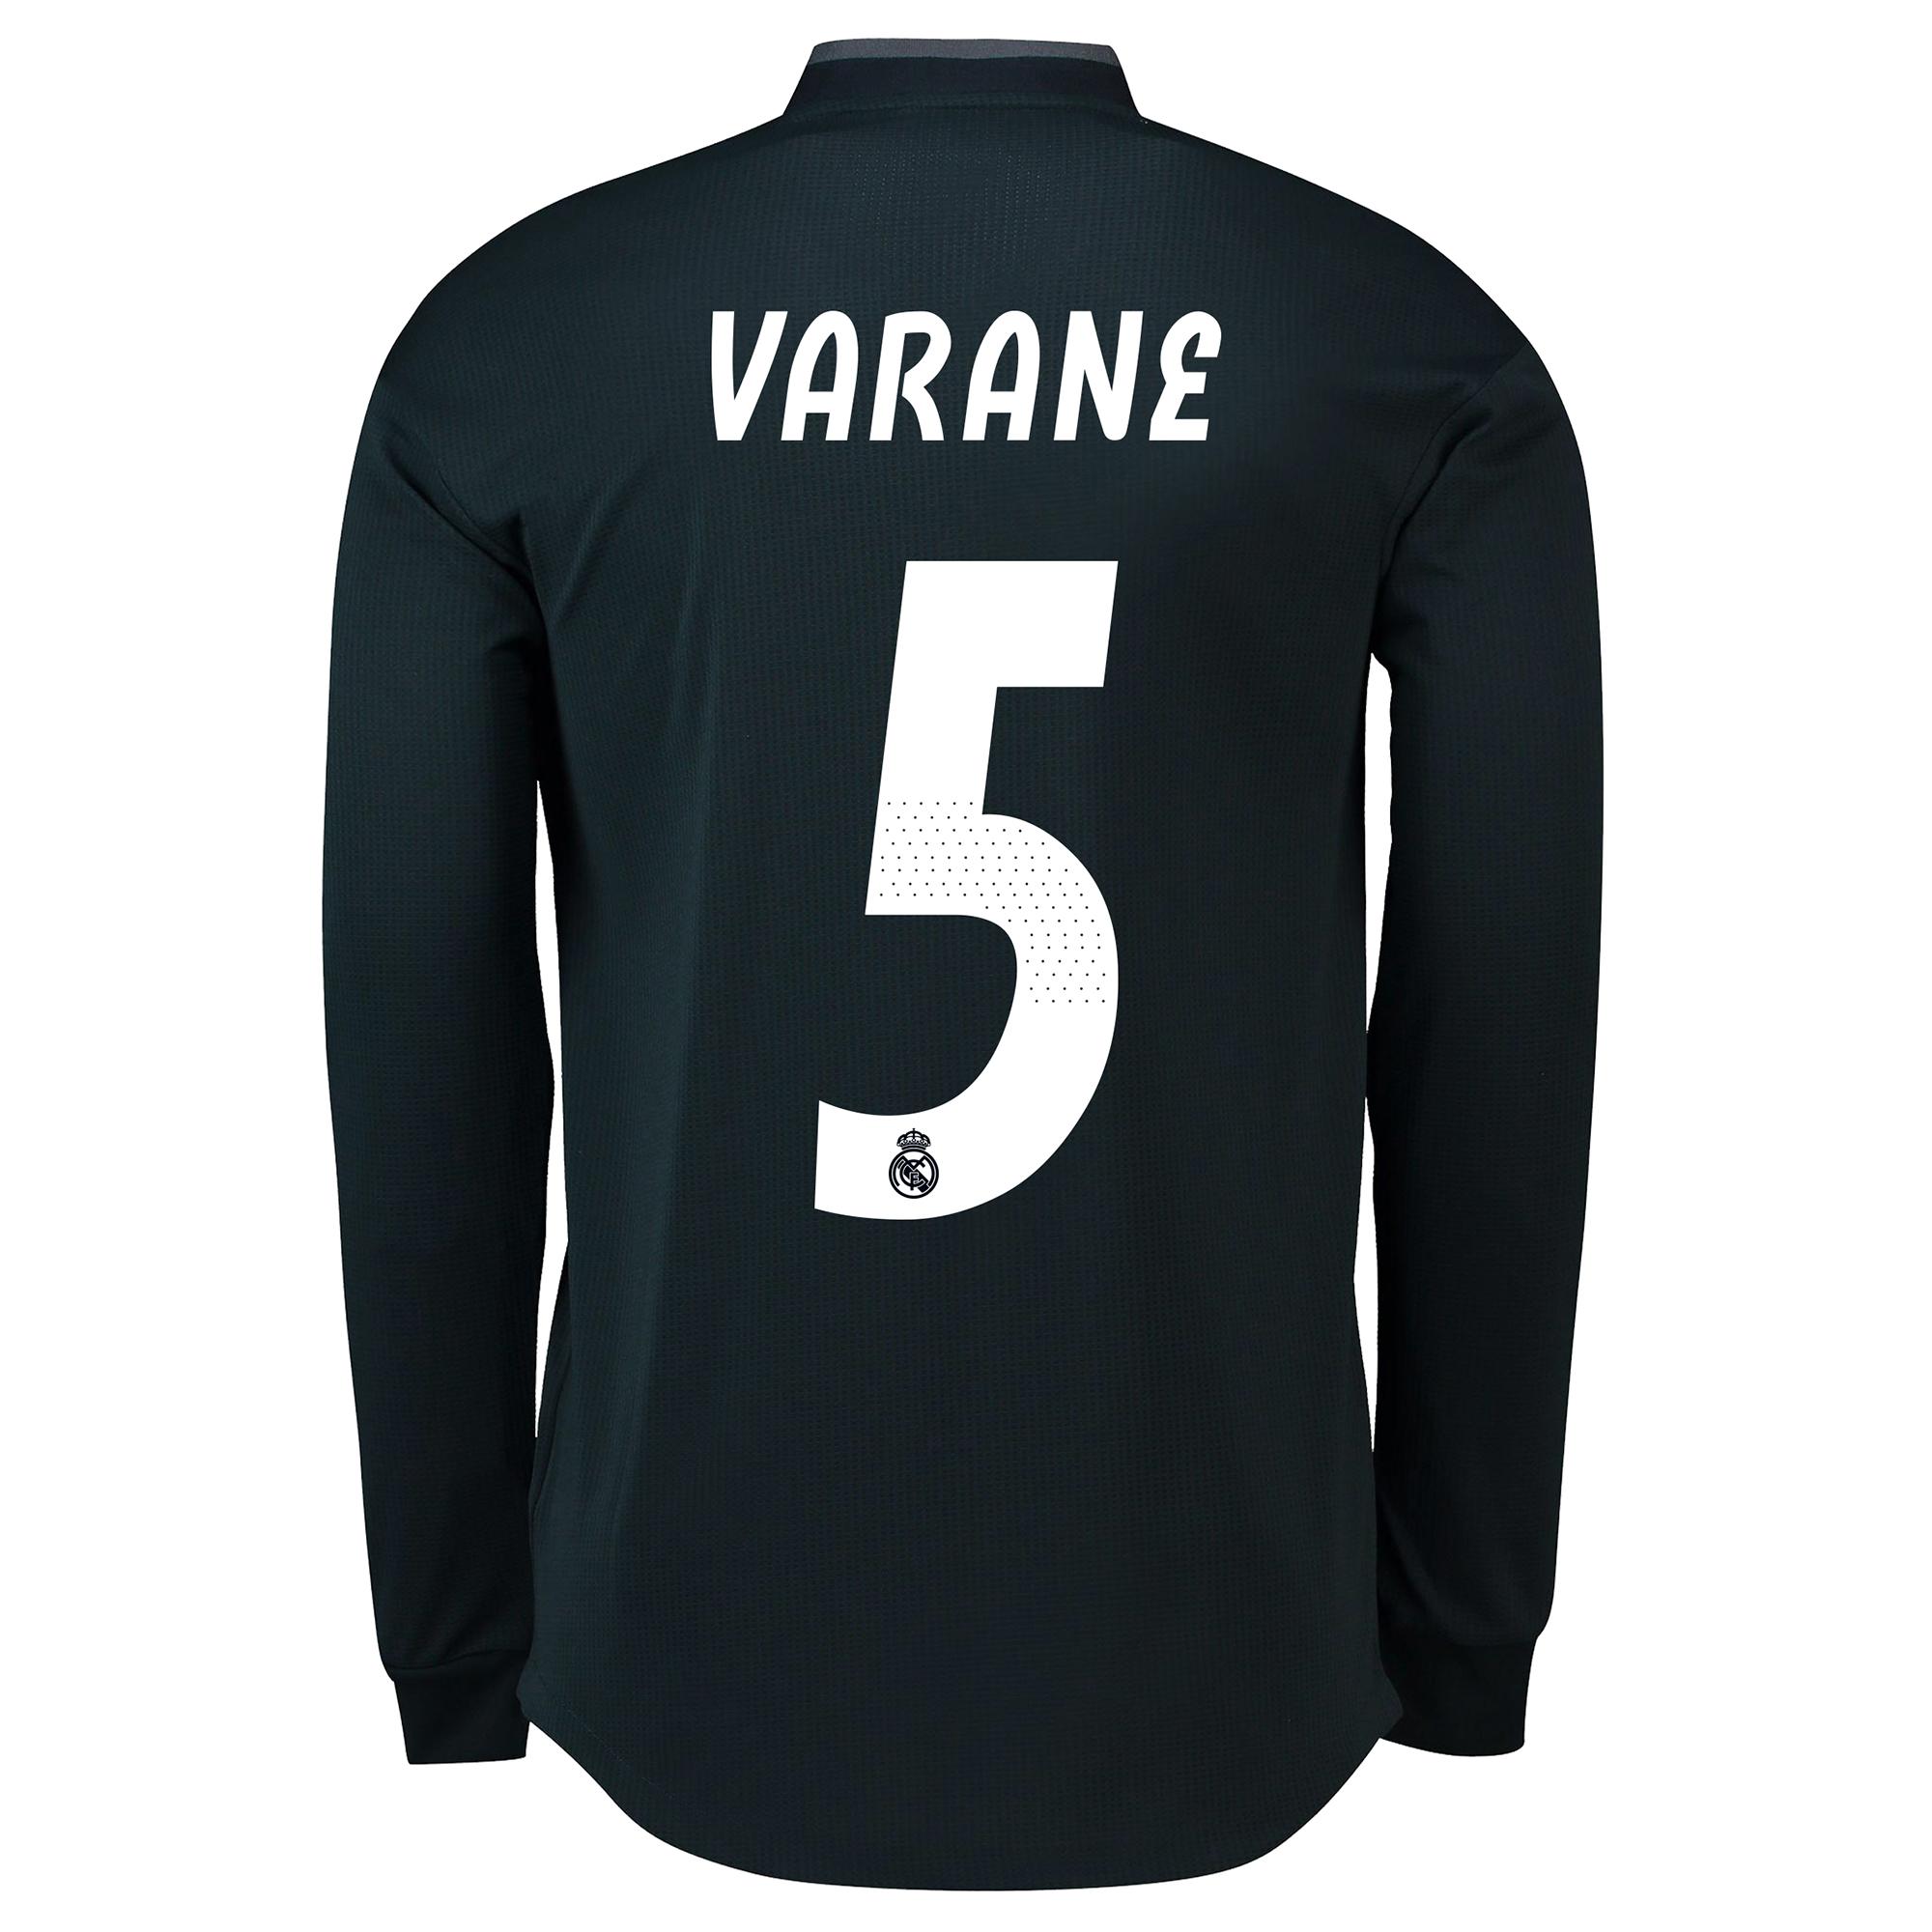 Image of Real Madrid Away Adi Zero Shirt 2018-19 - Long Sleeve with Varane 5 printing